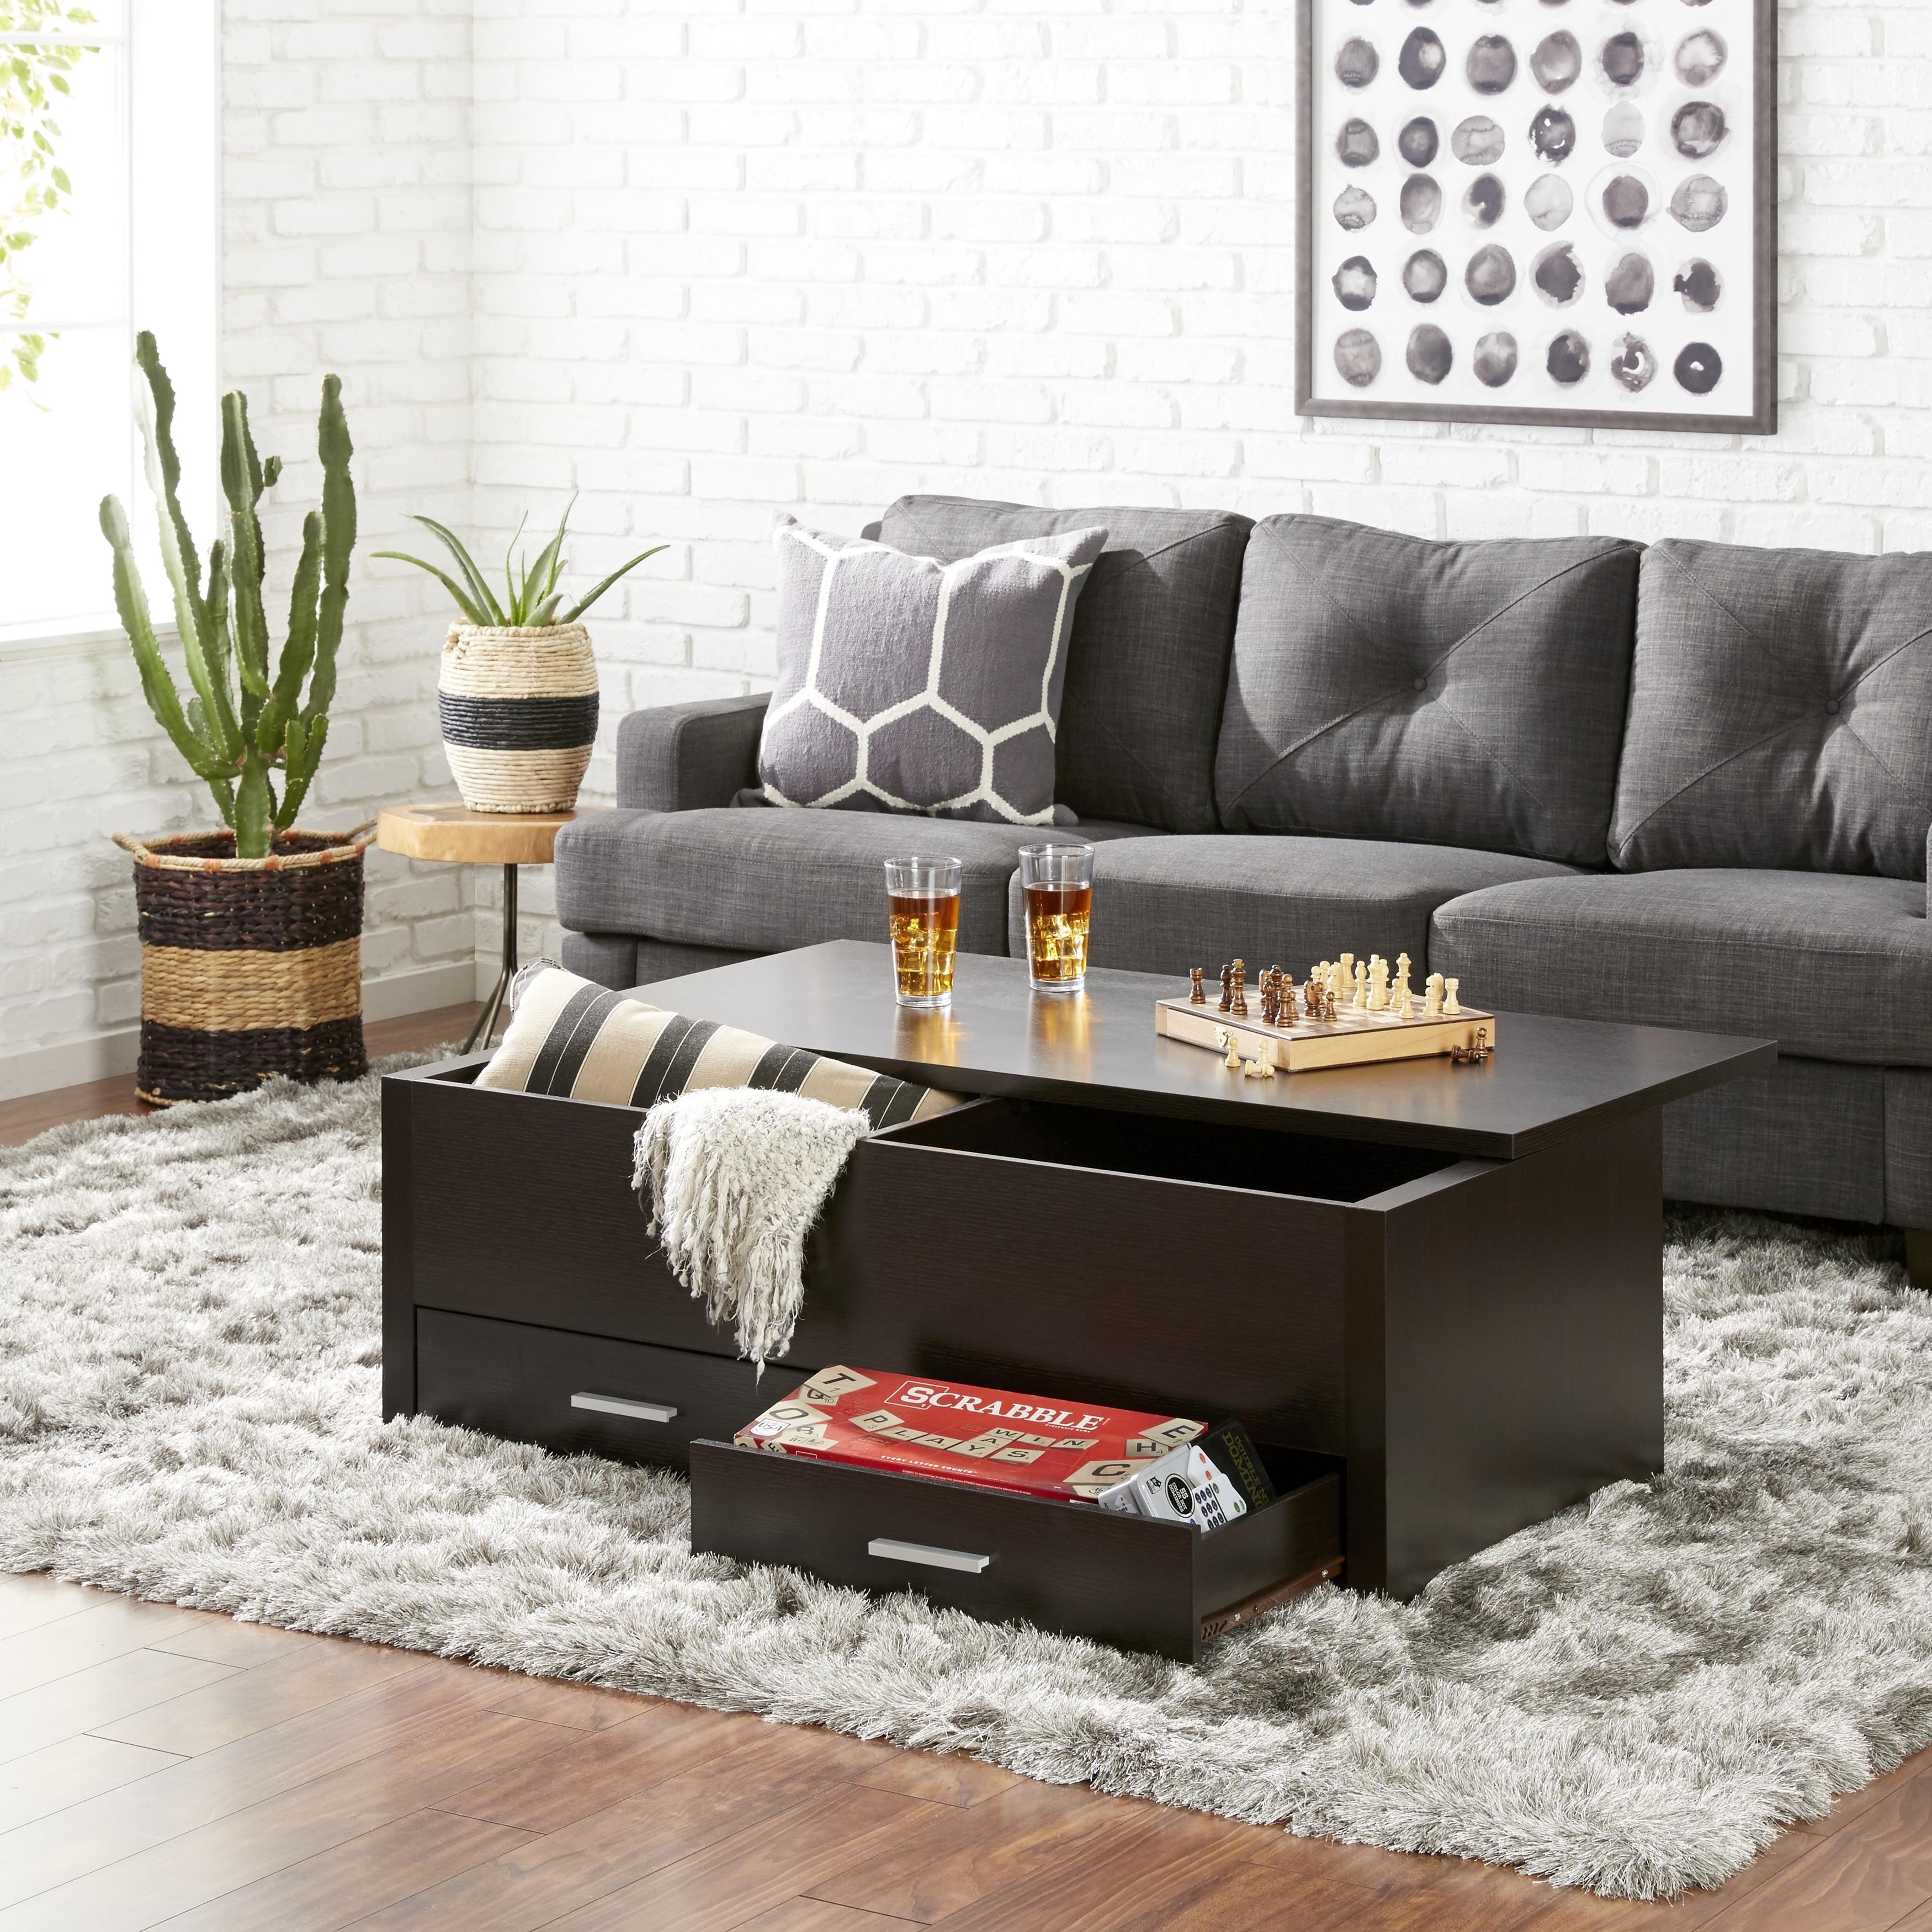 Prime Furniture Of America Knox Espresso Wood Storage Box Coffee Table Uwap Interior Chair Design Uwaporg